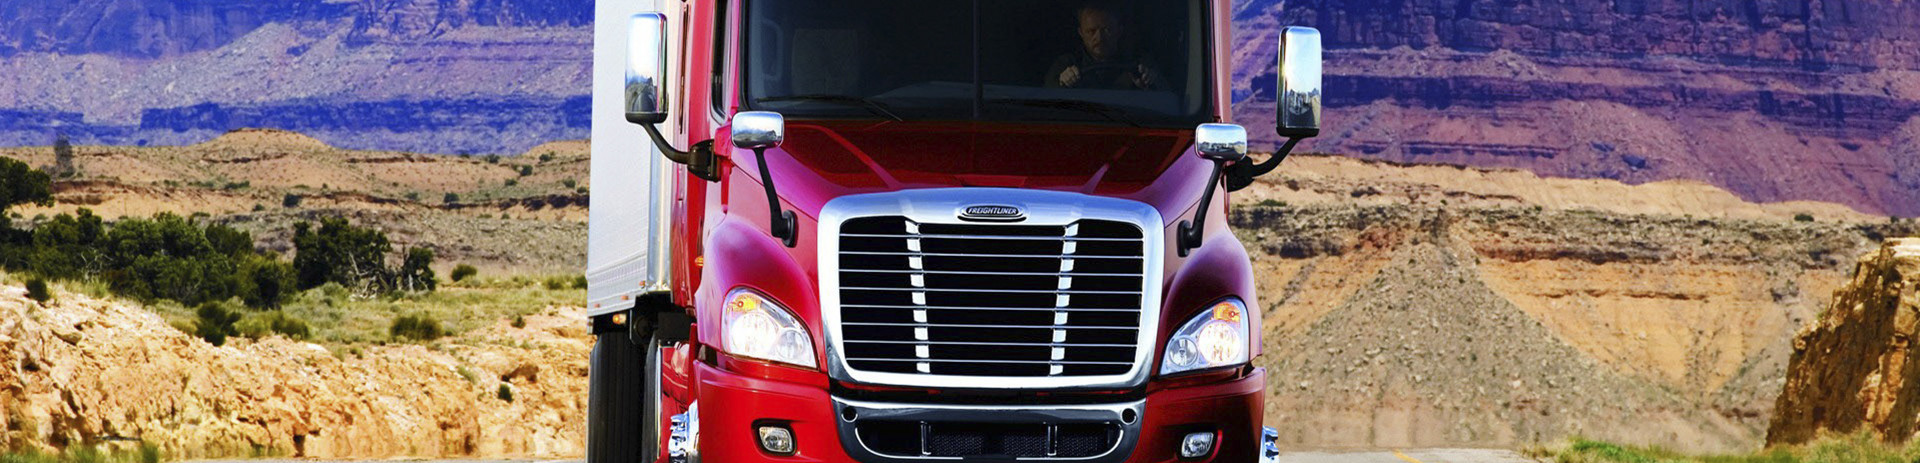 truck-f9a5c676e3-3000 copy